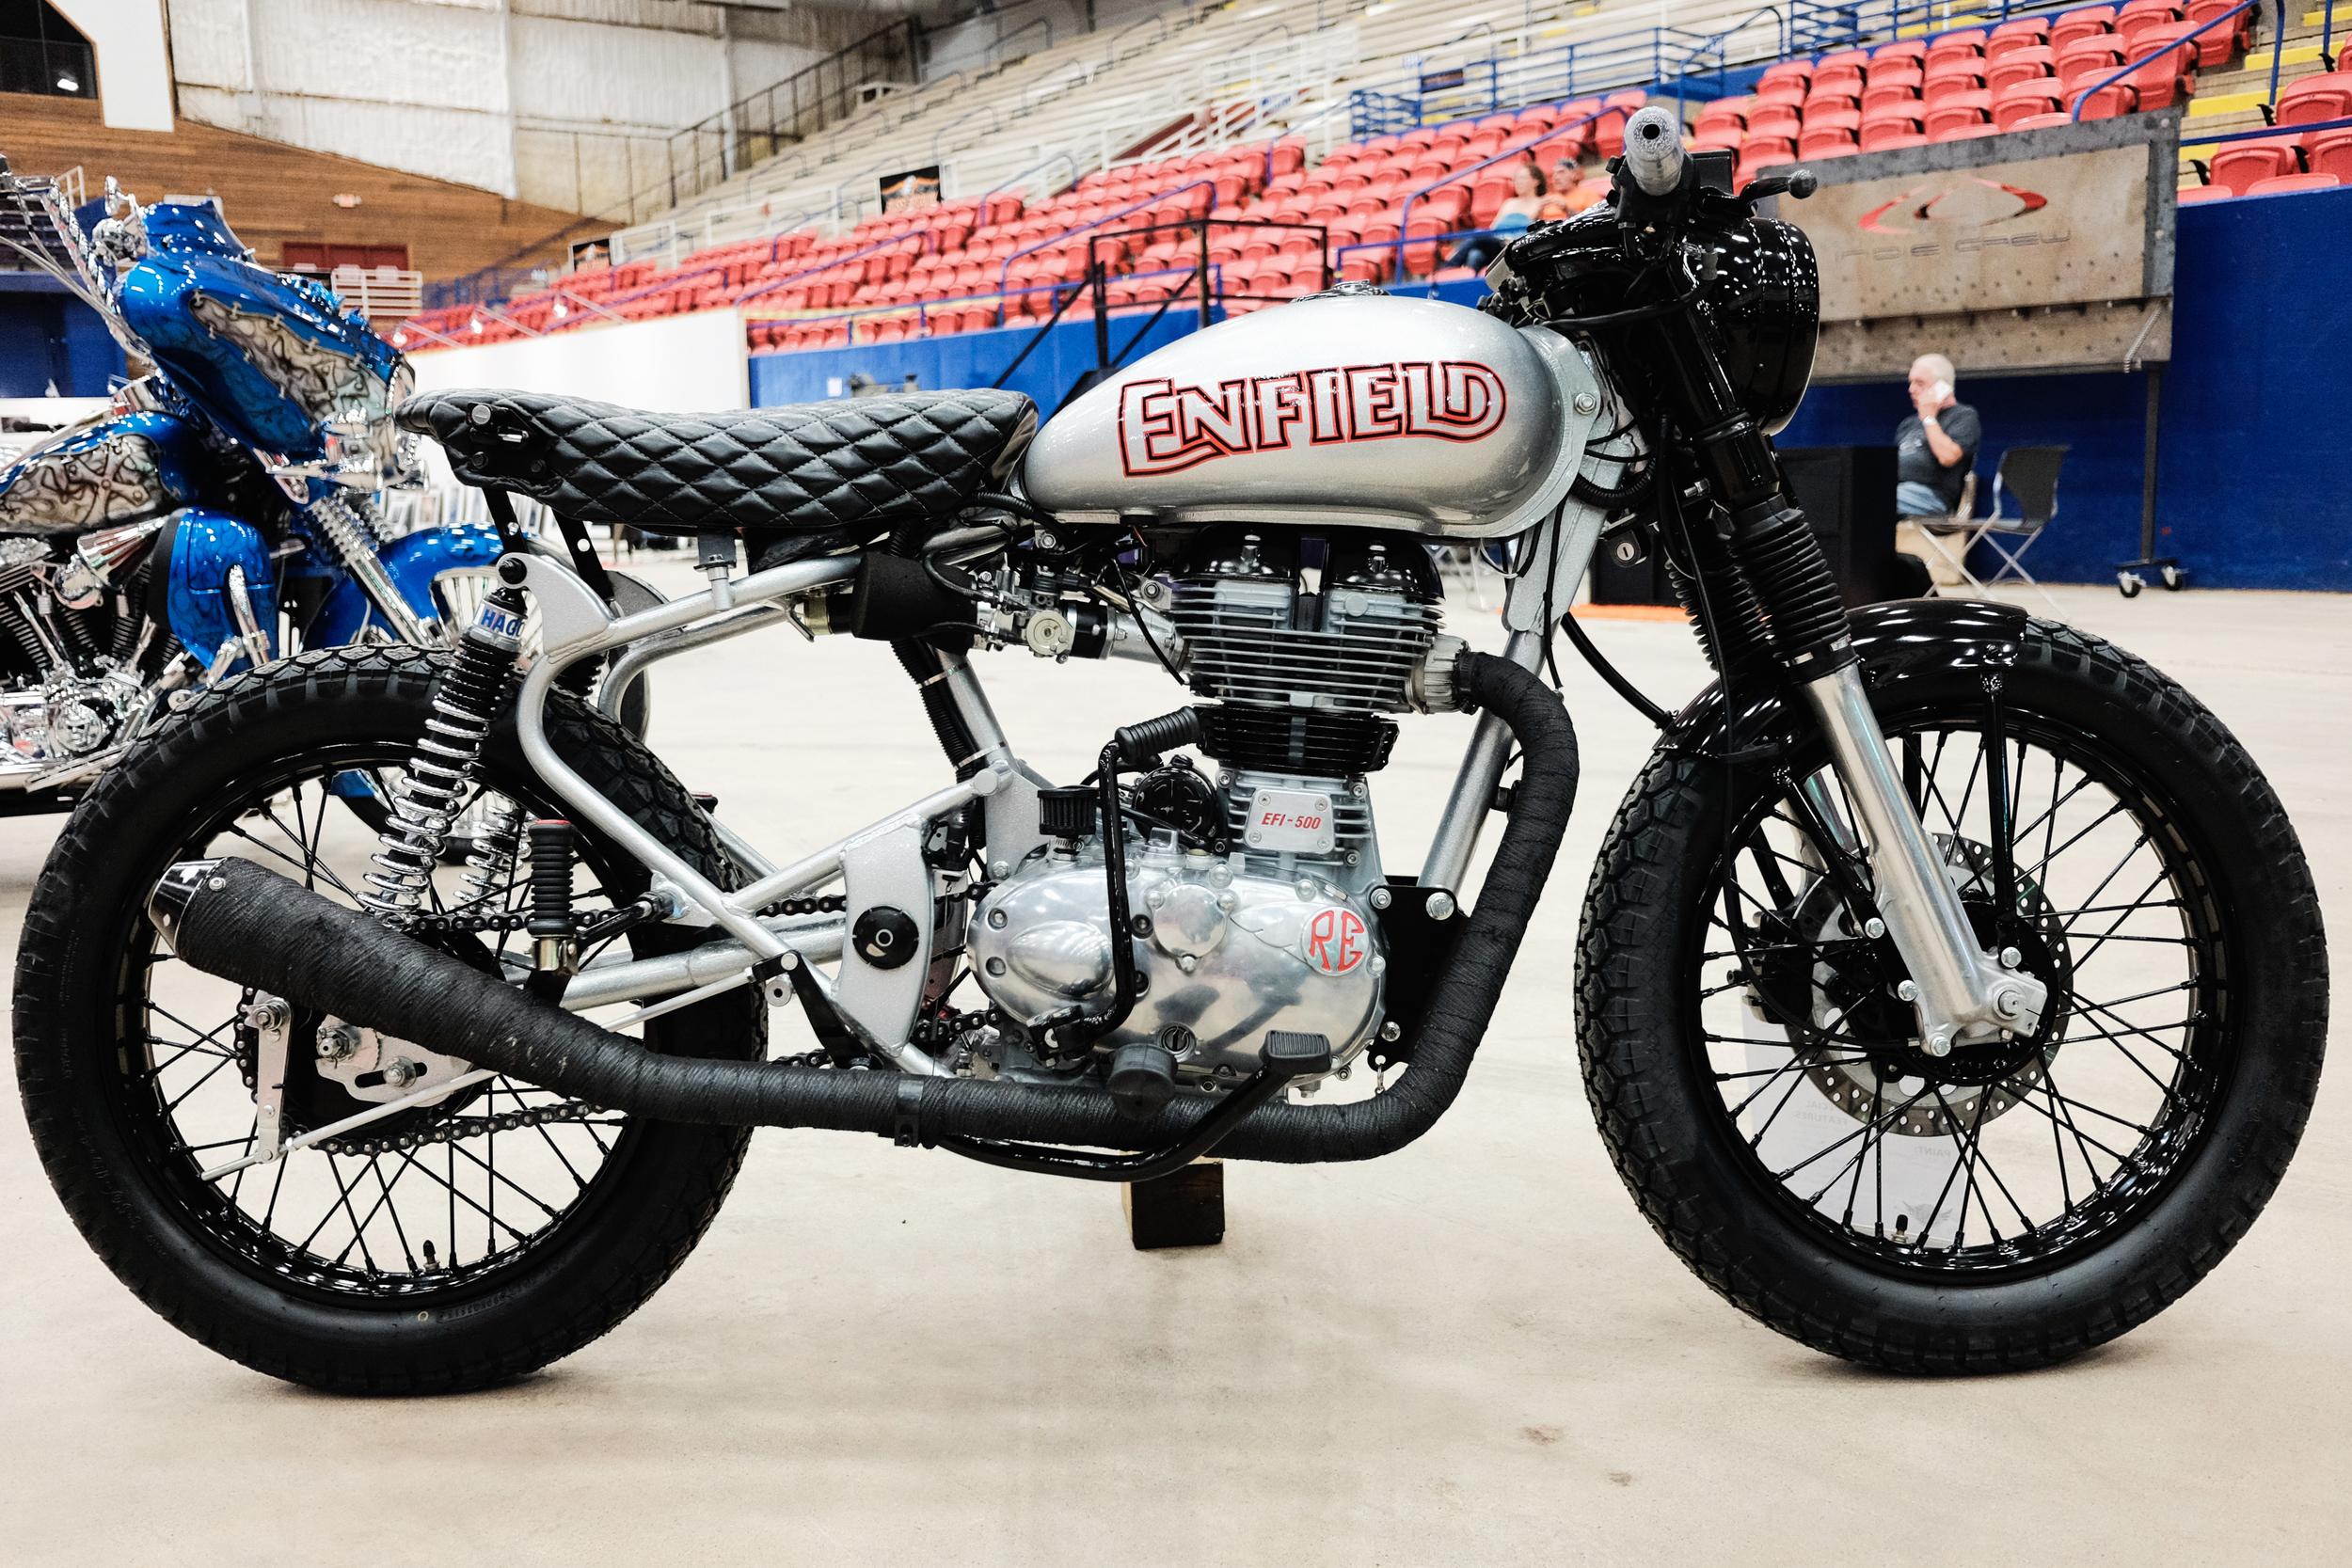 rot-rally-custom-bike-show-2016-0005.jpg